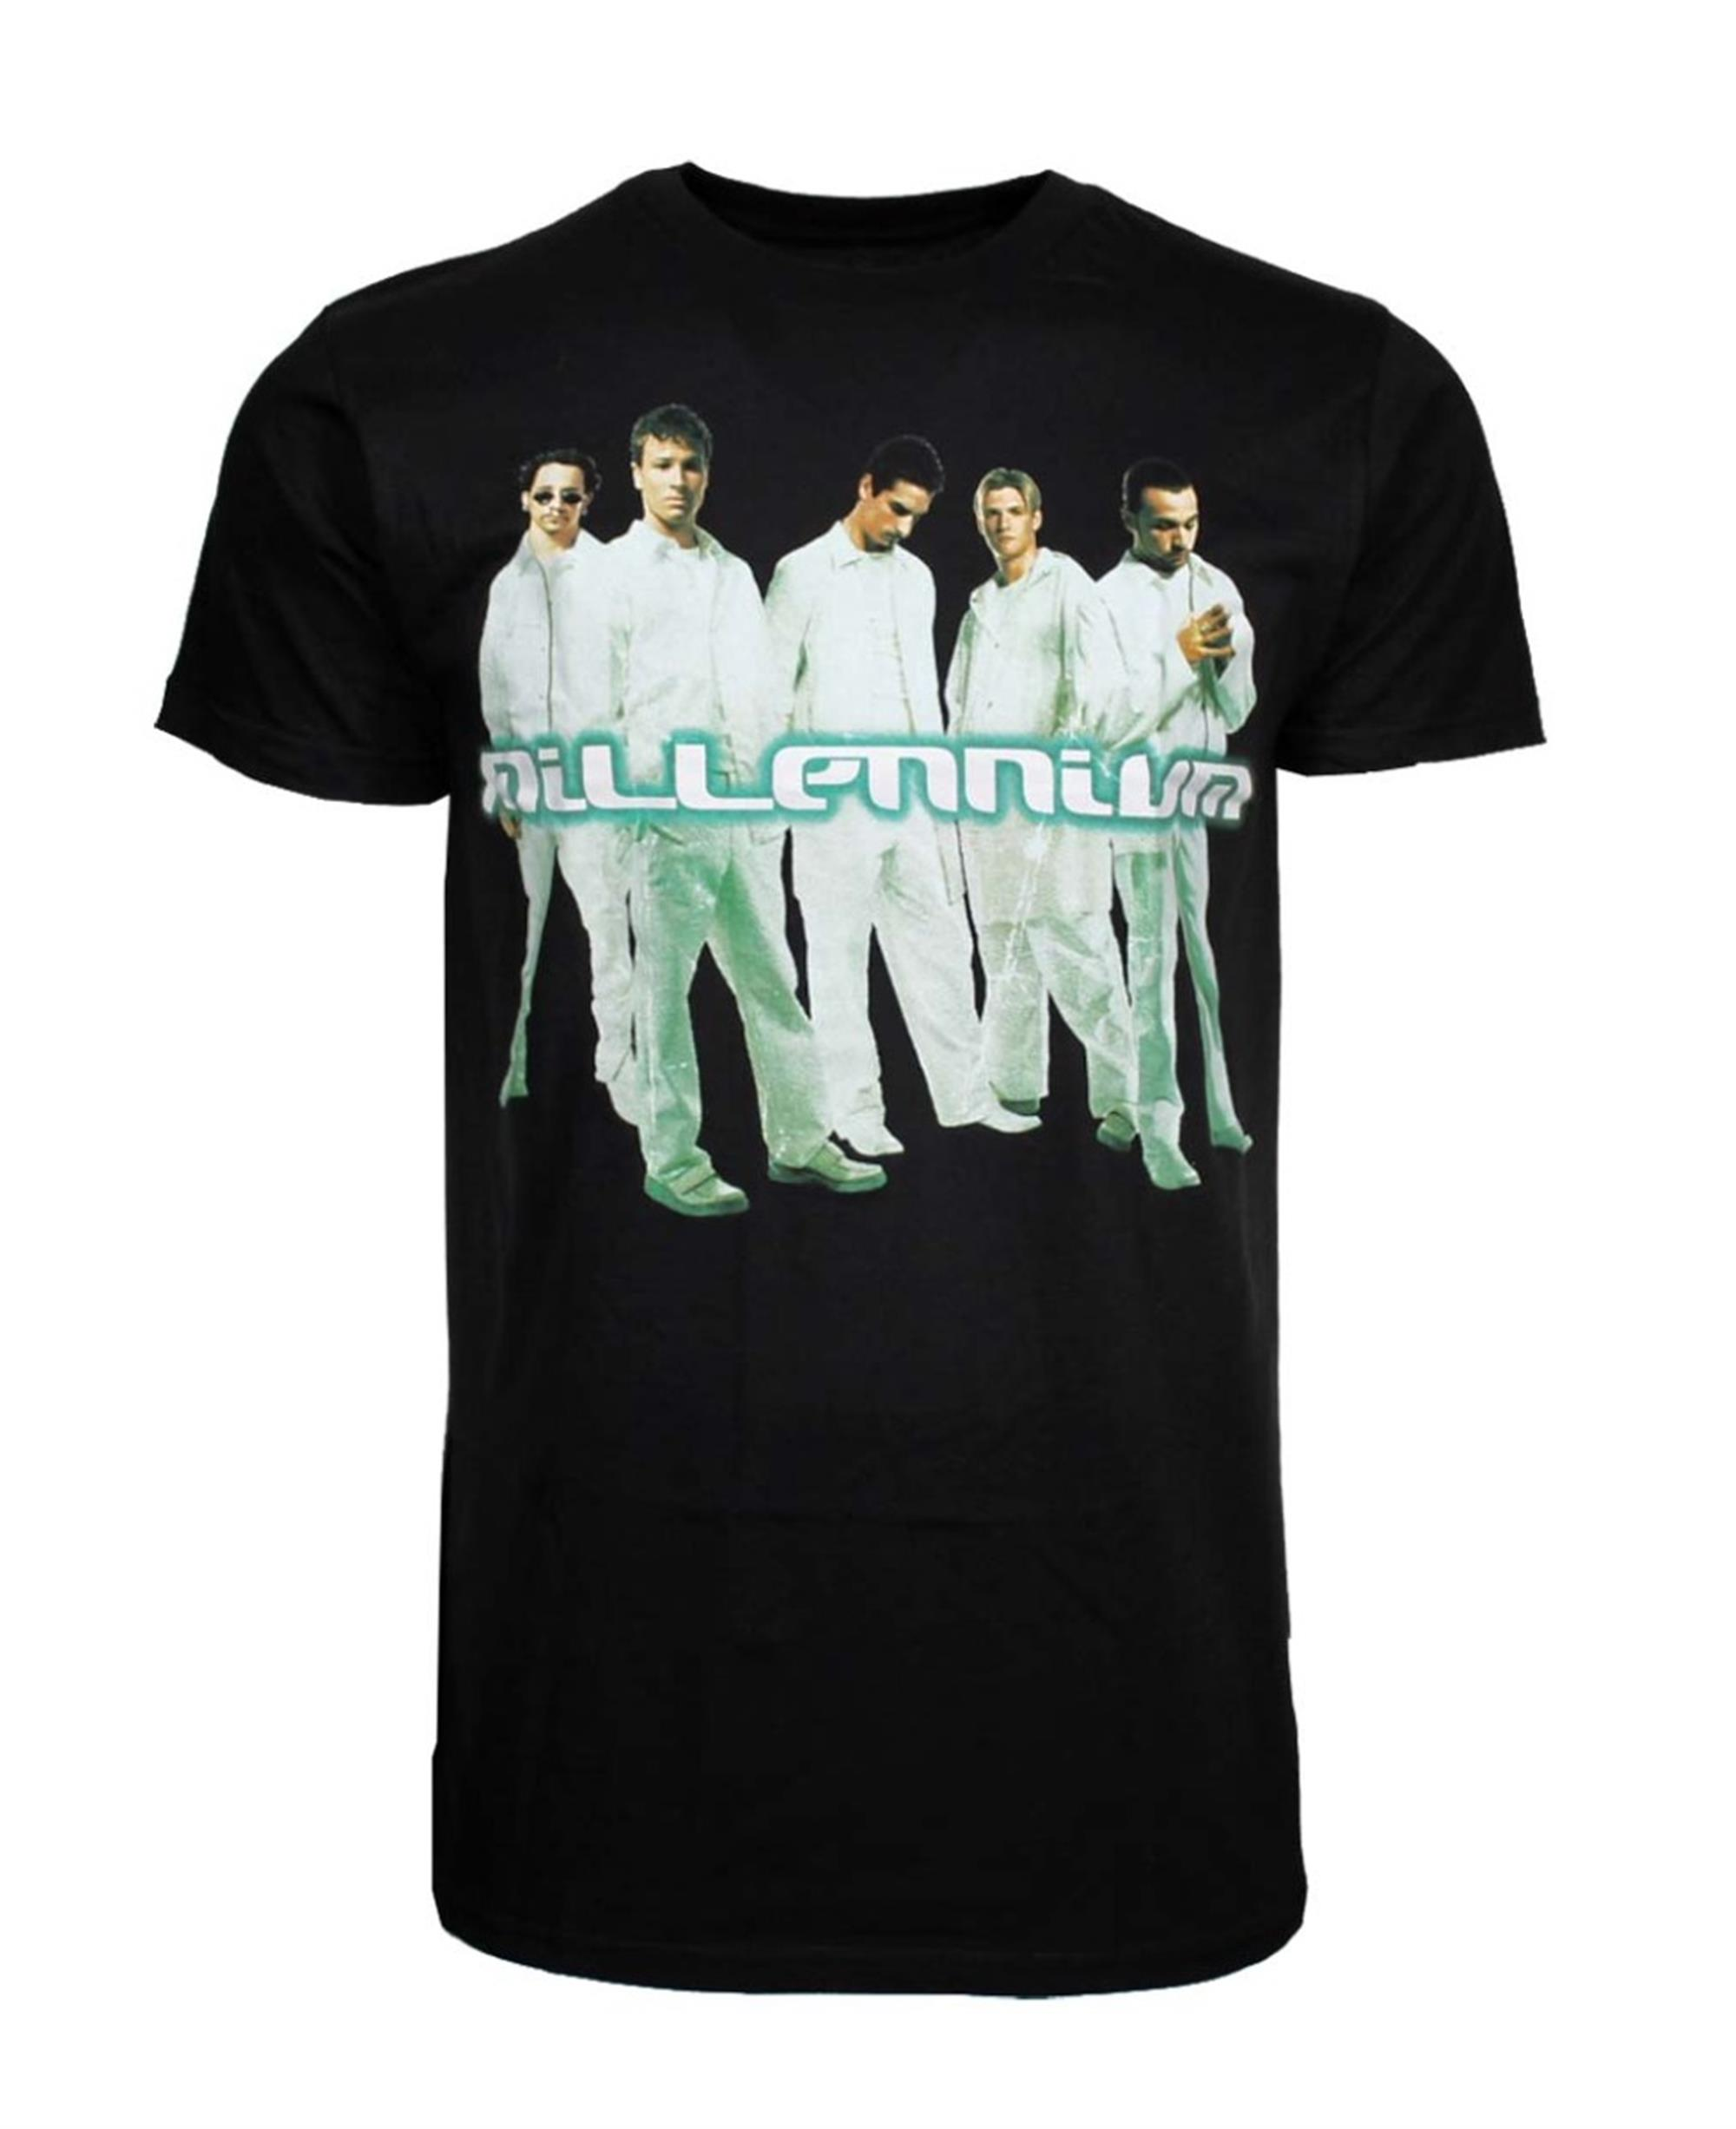 Backstreet Boys Cut Out T-Shirt